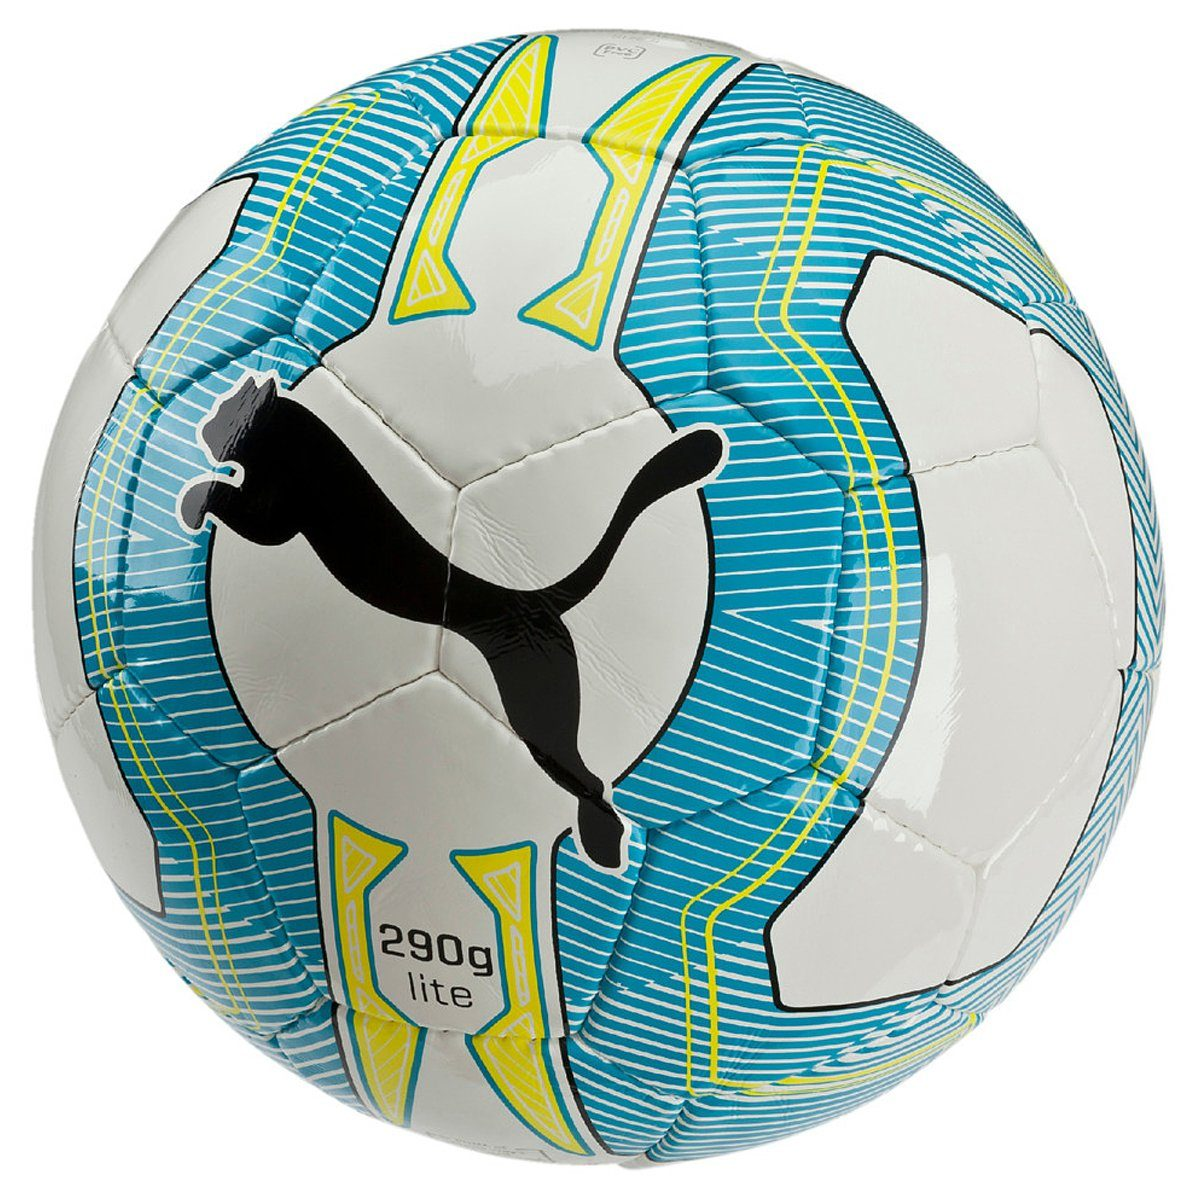 PUMA evoPower Lite 3 Trainingsball